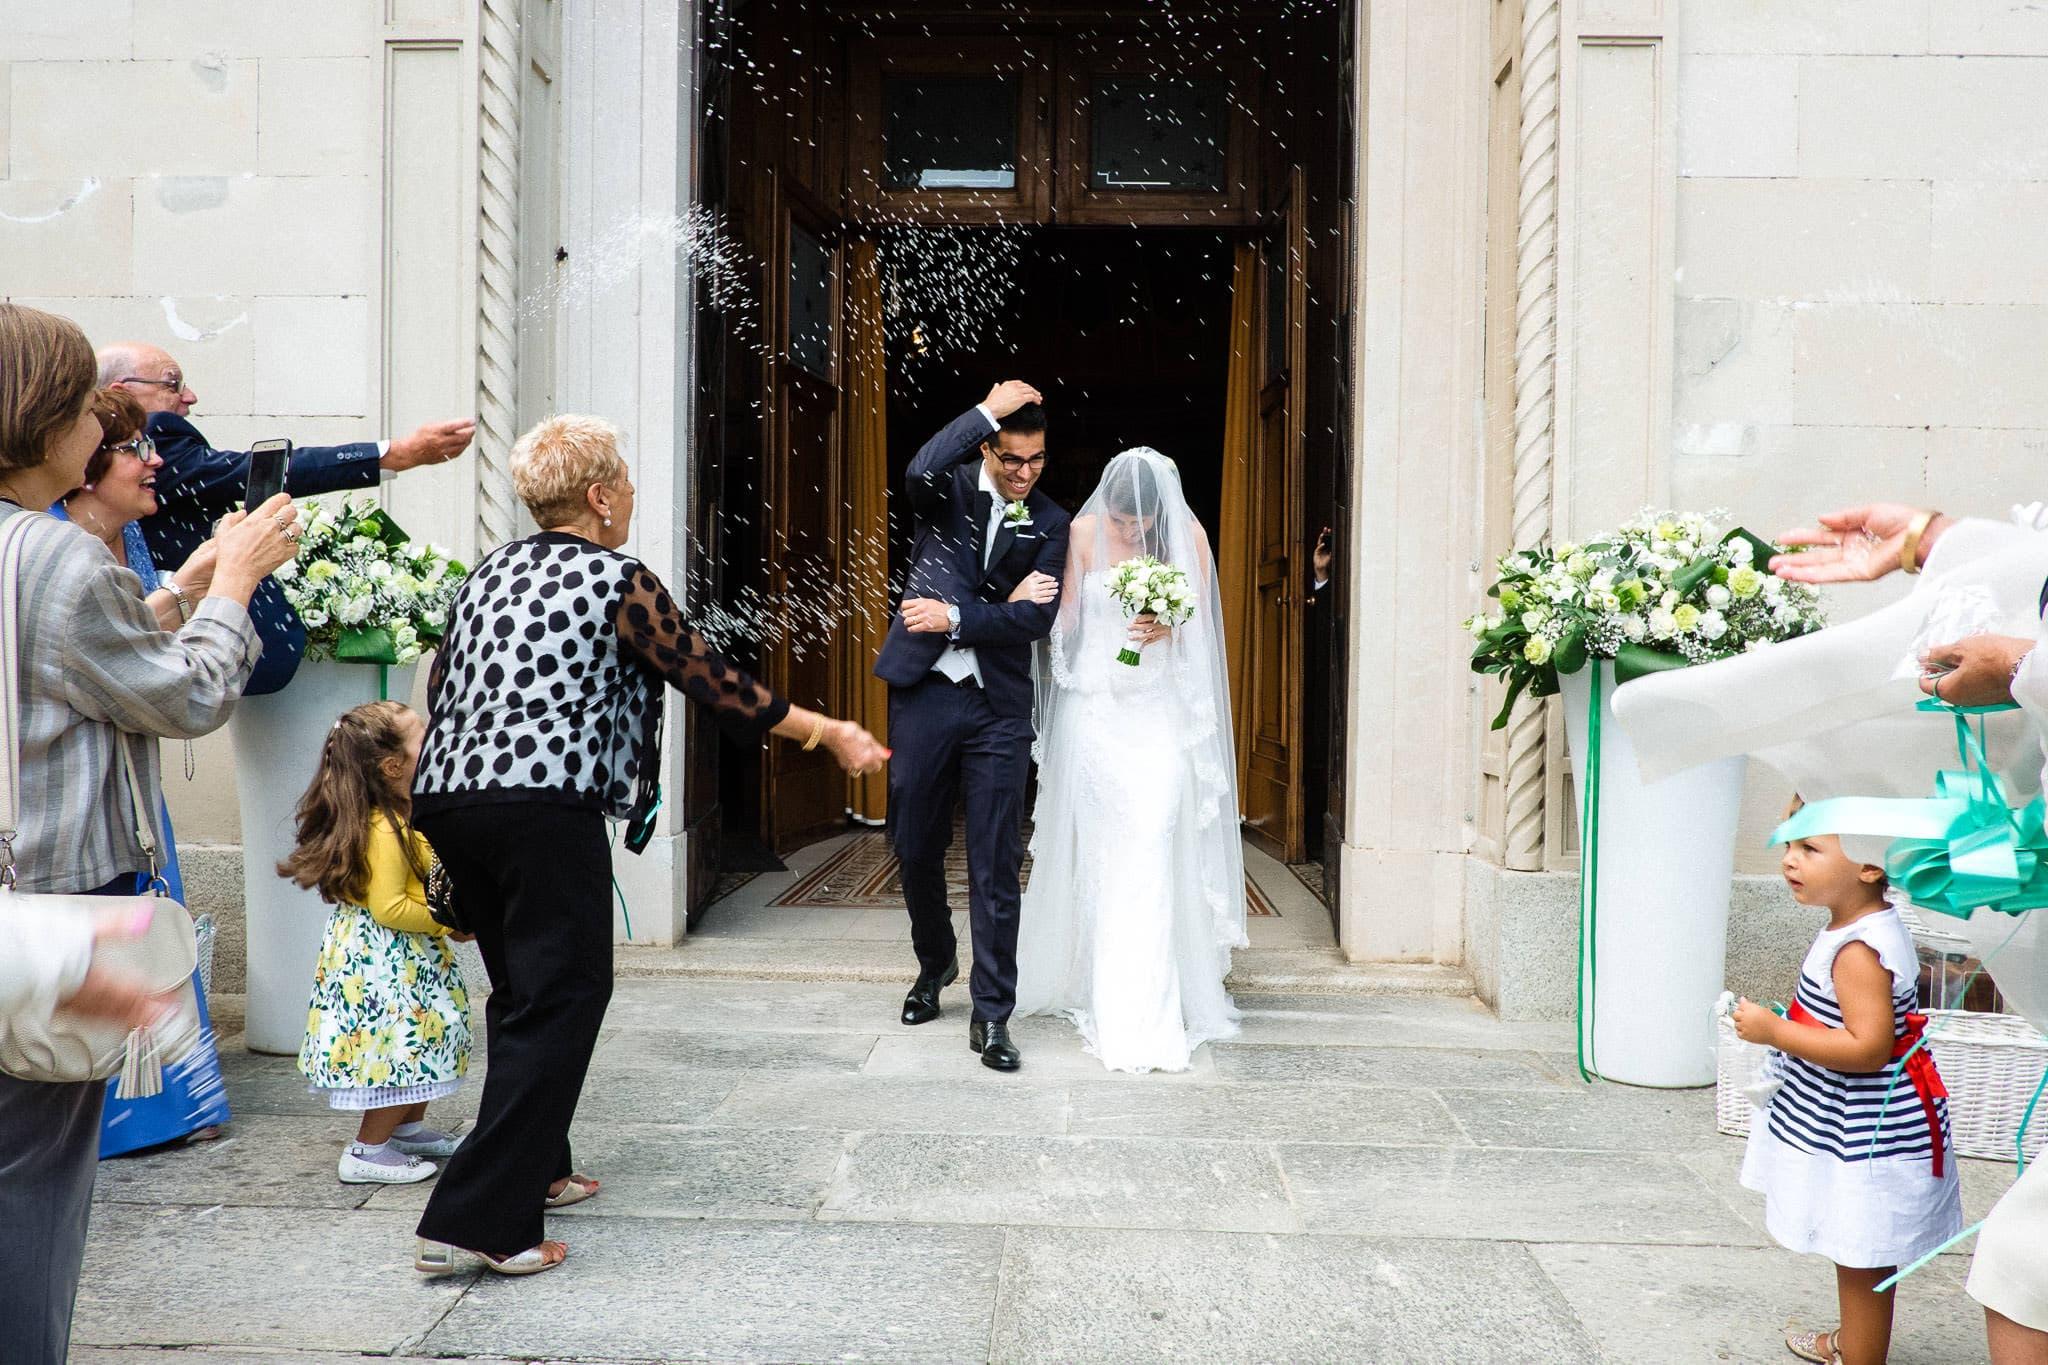 fotografo matrimonio cascina diodona varese lucarossifoto 00012